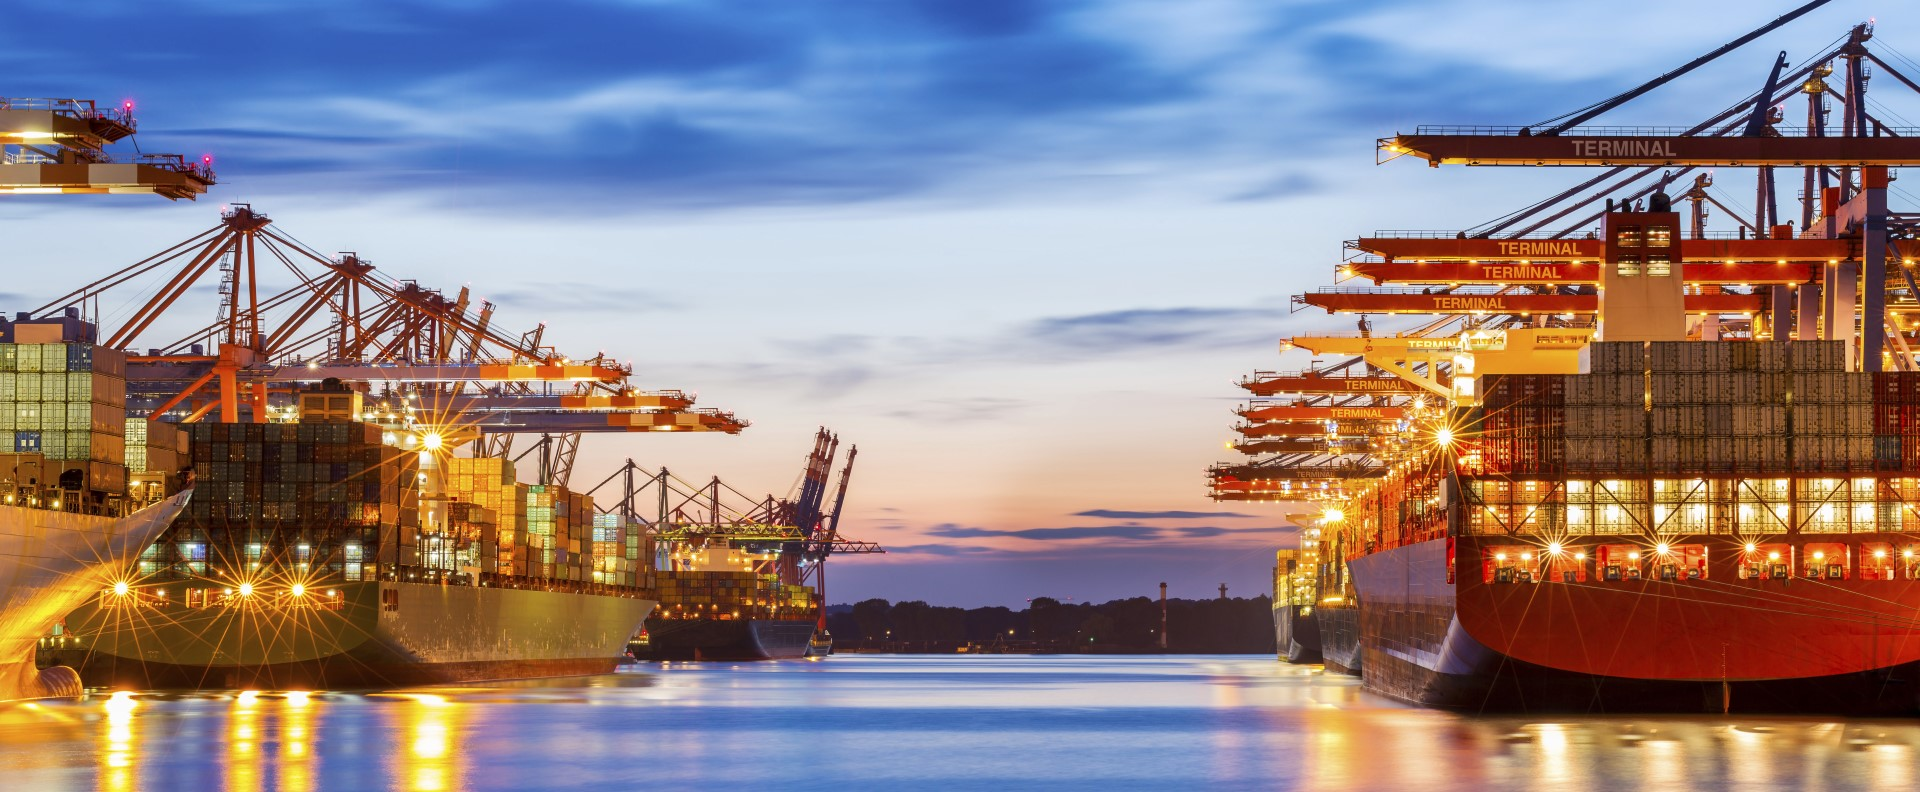 Ports-shipping-night (2) (Large)